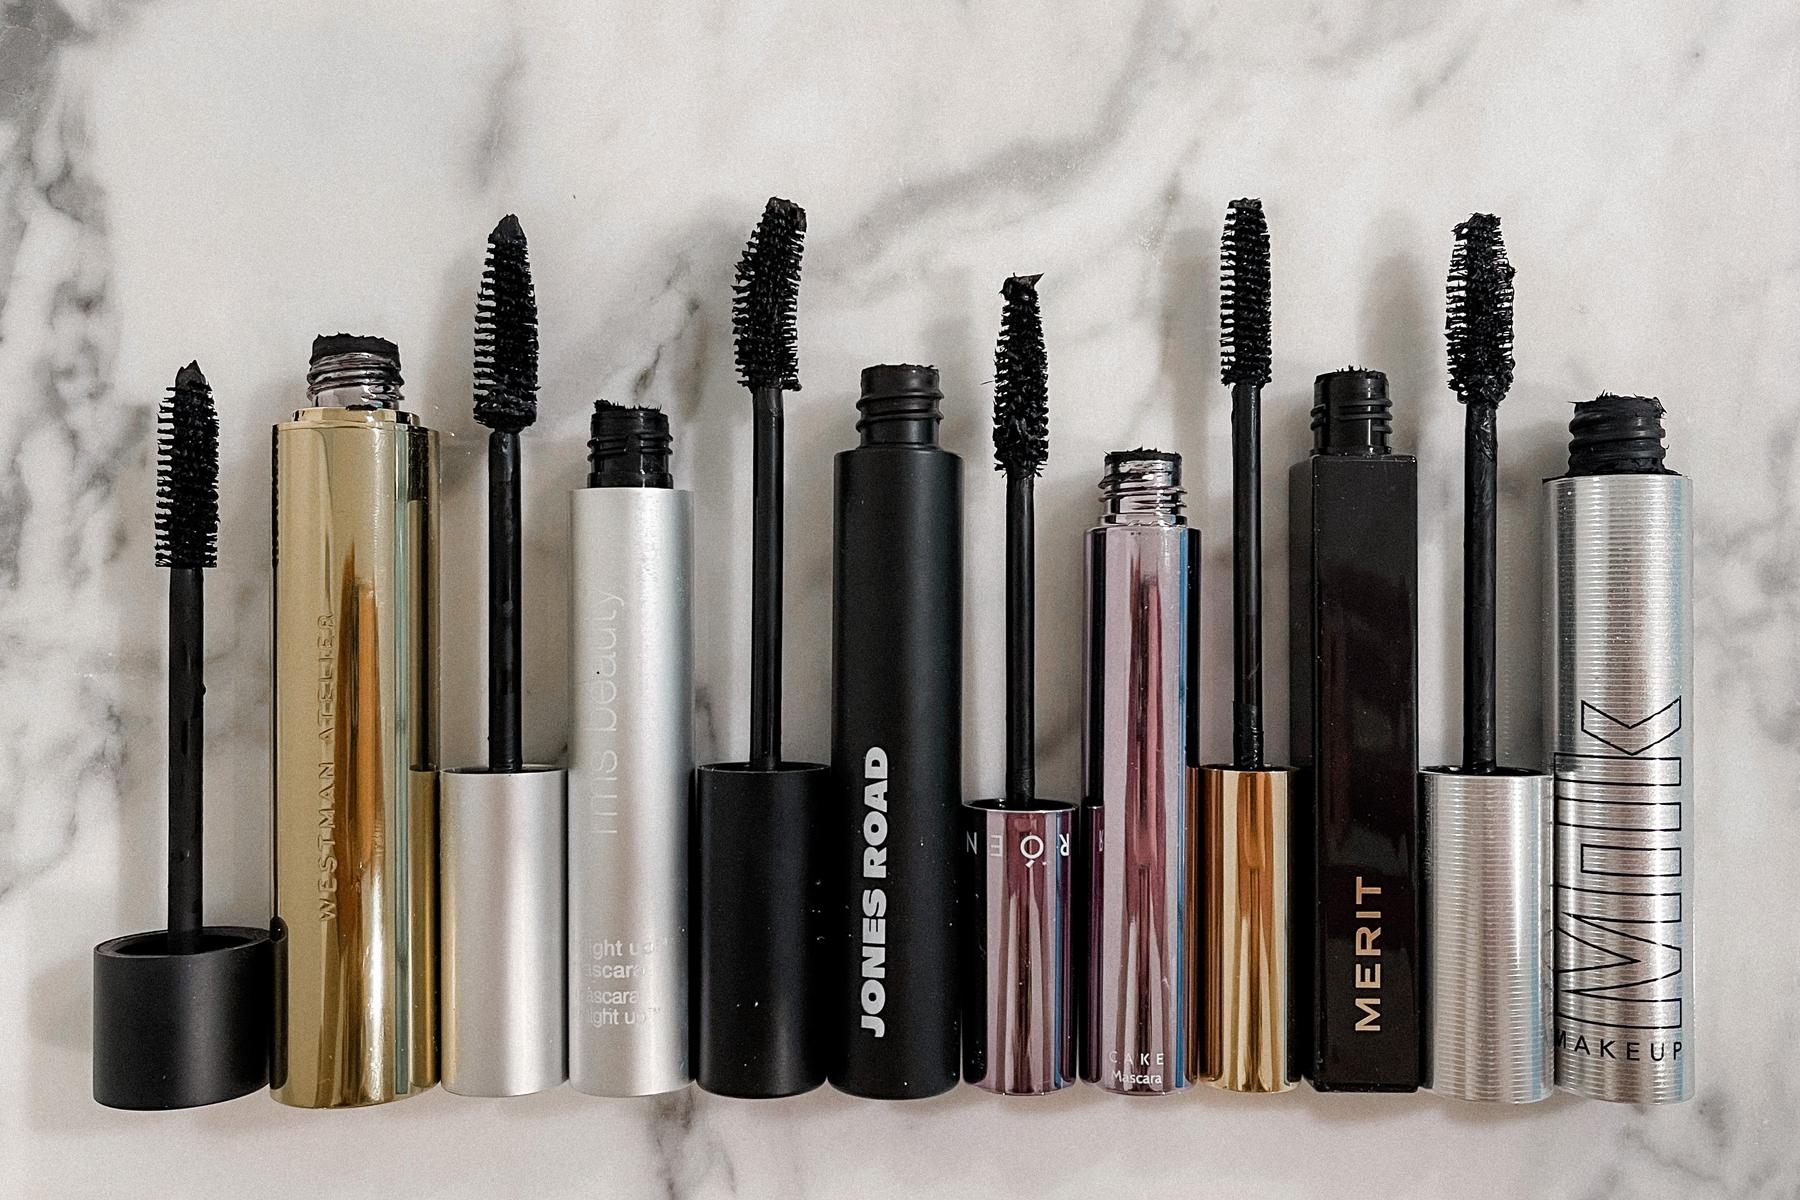 Fashion Jackson Clean Mascara Brands